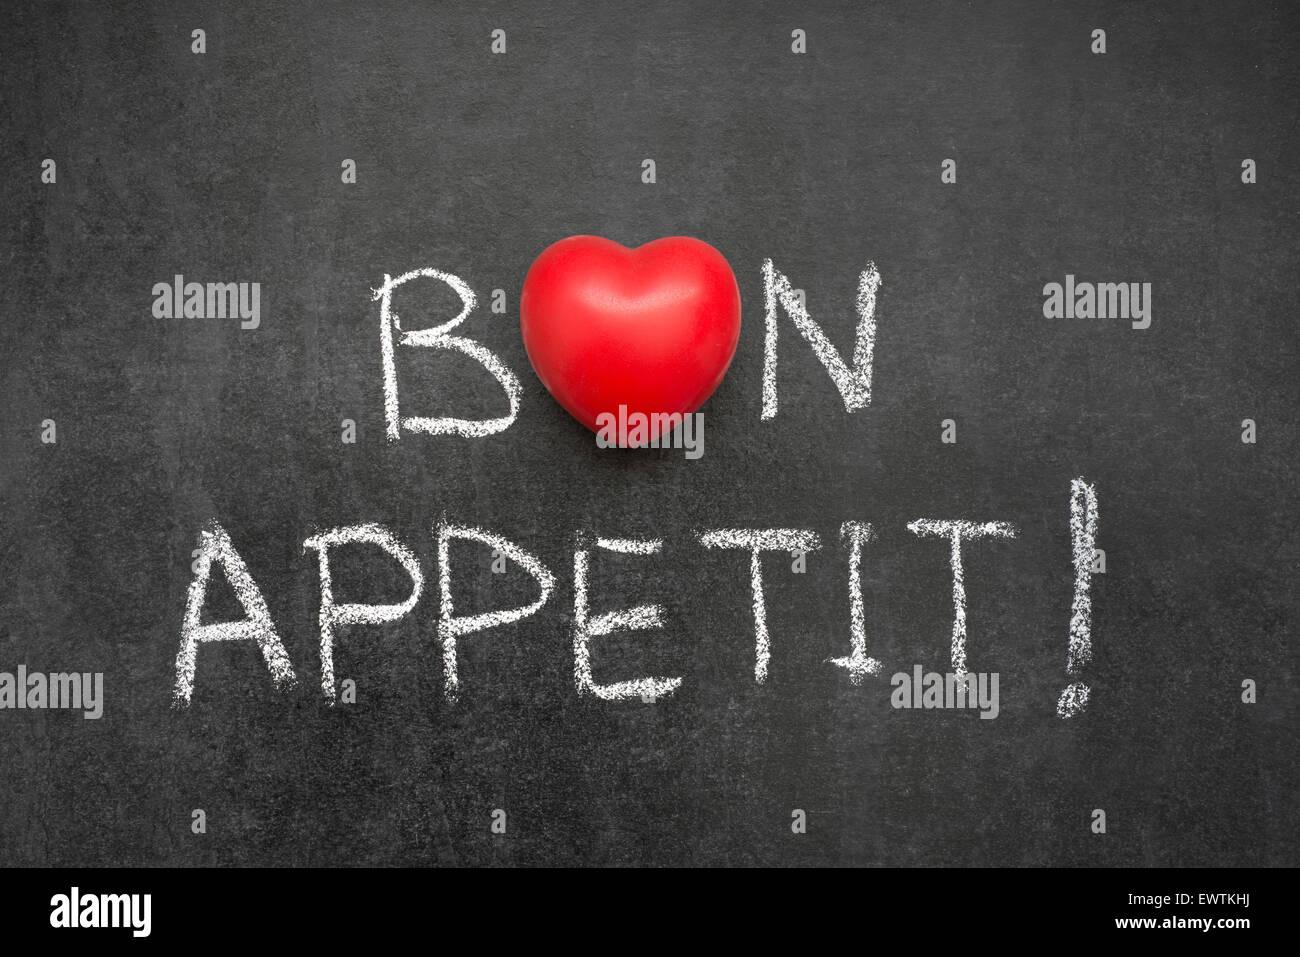 Bon Appetit Exclamation Handwritten On Blackboard With Heart Symbol